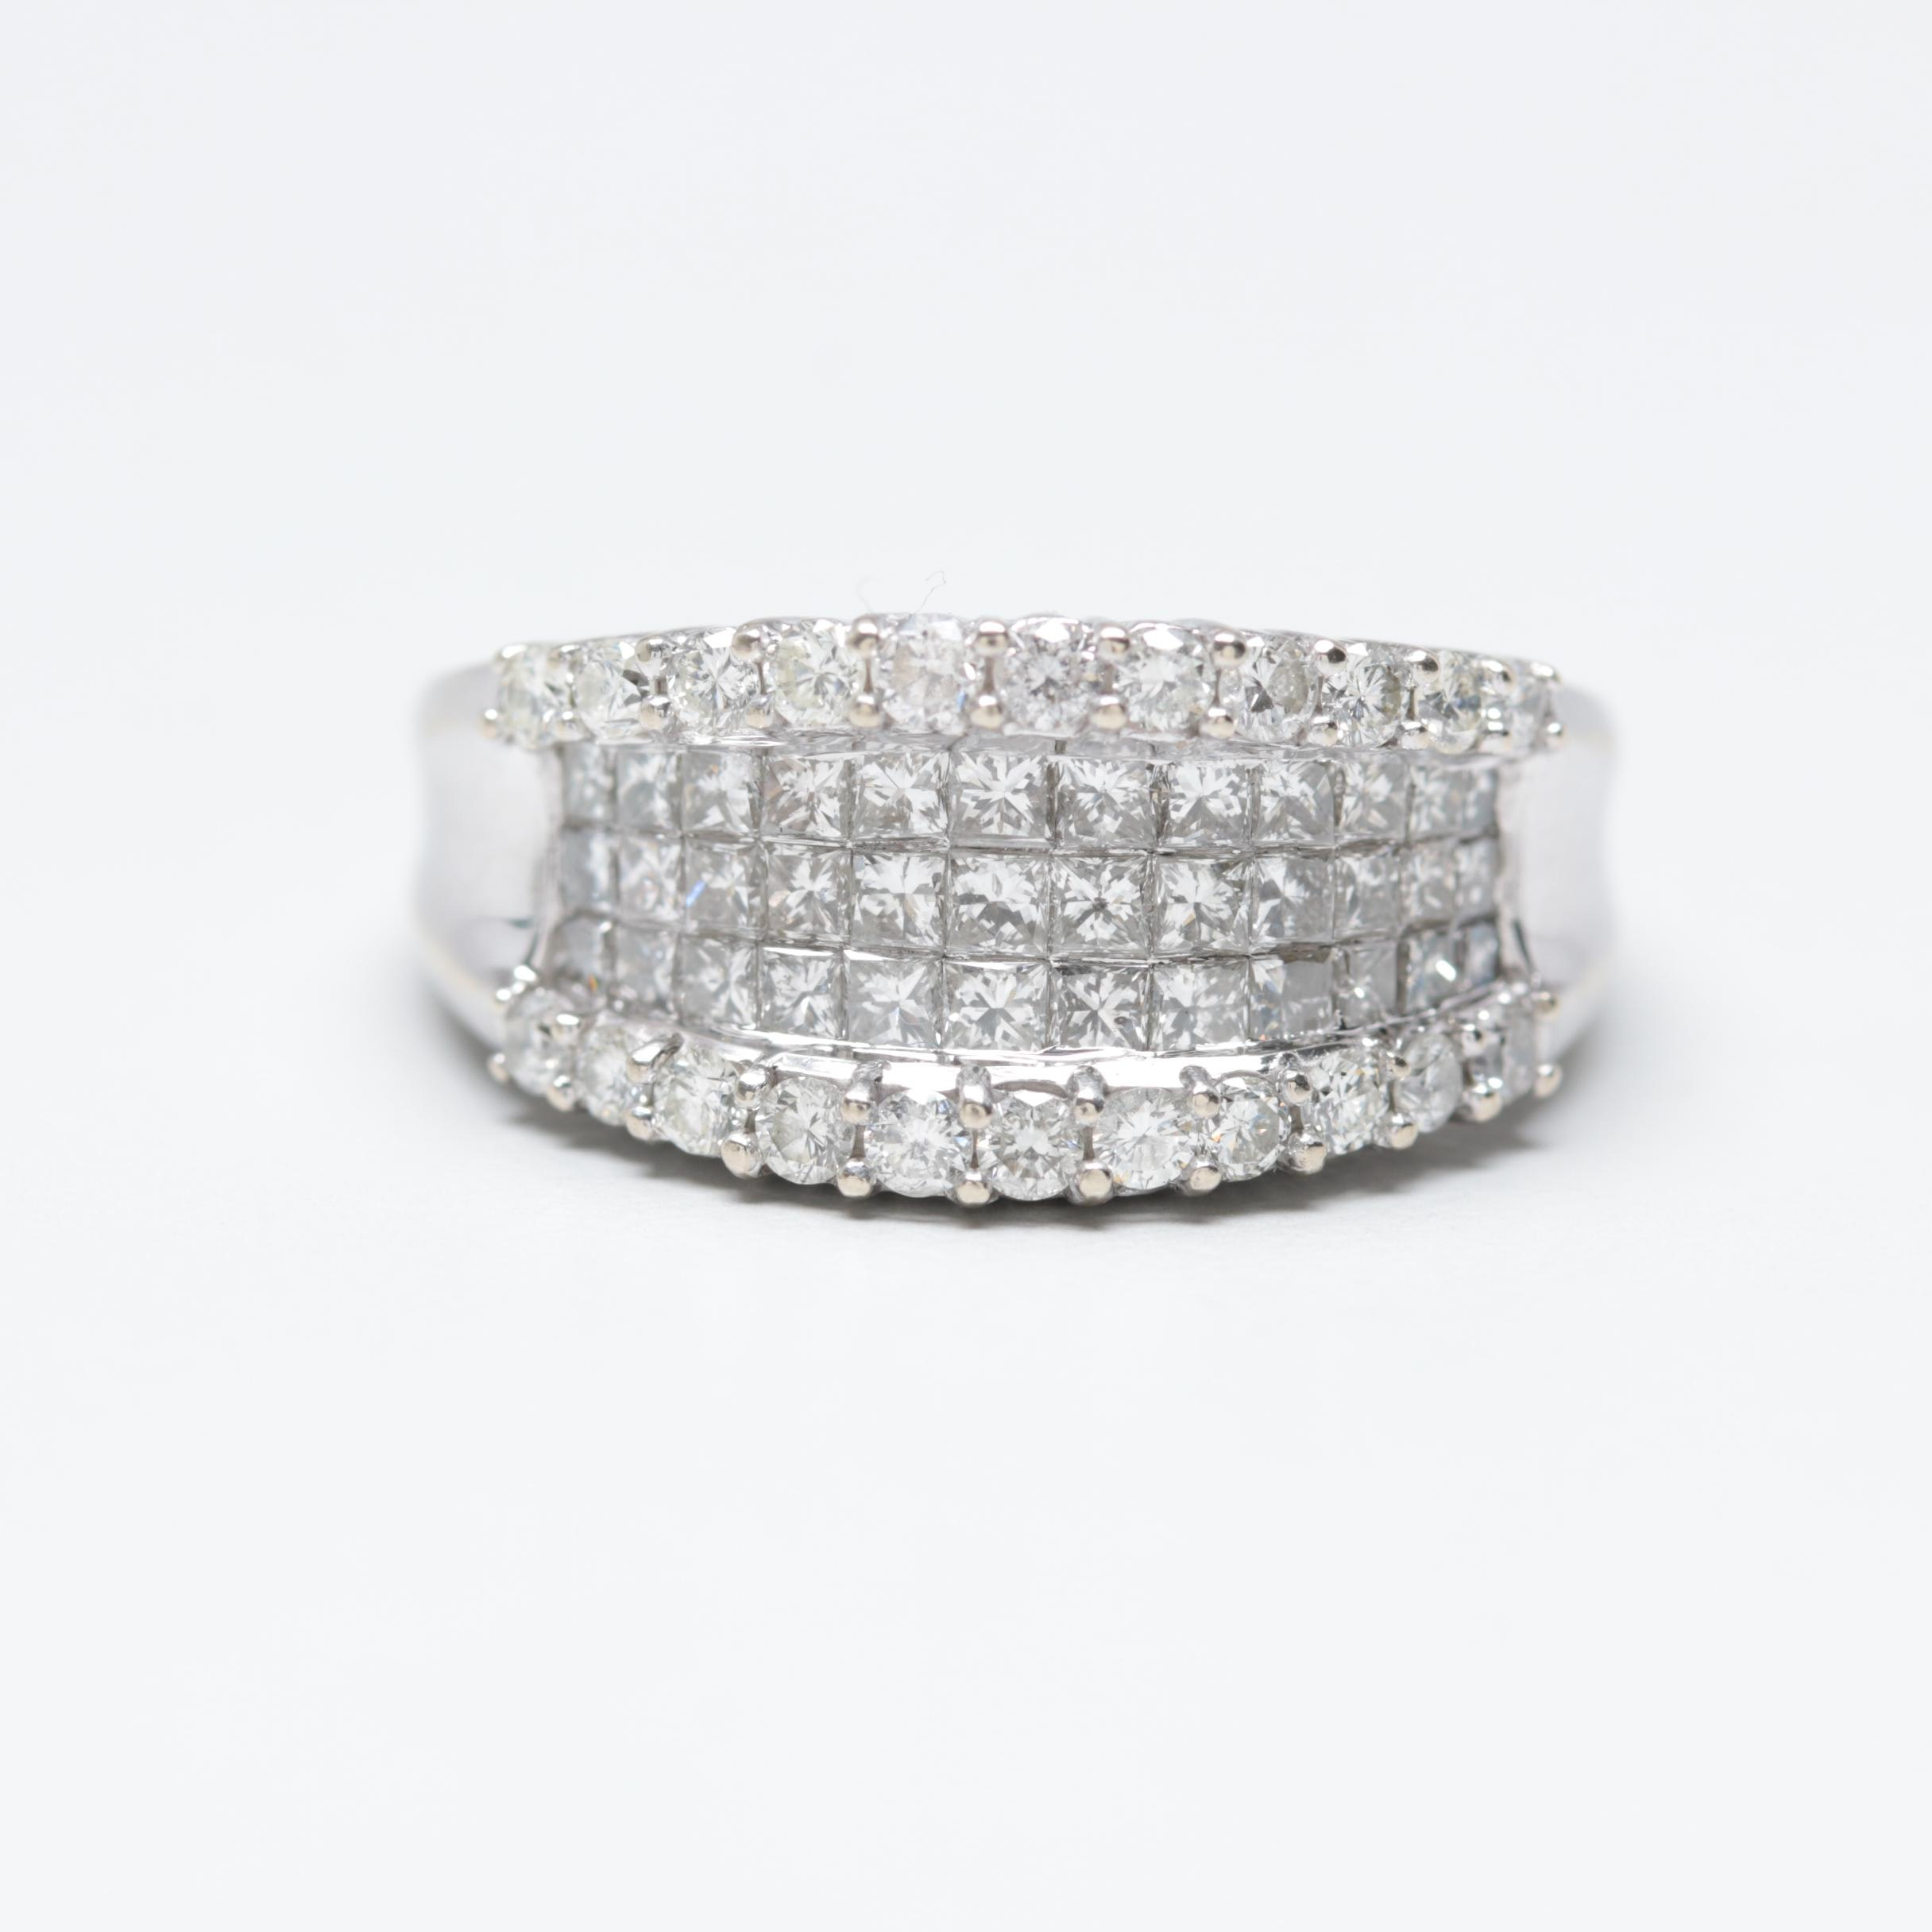 14K White Gold 2.08 CTW Diamond Ring